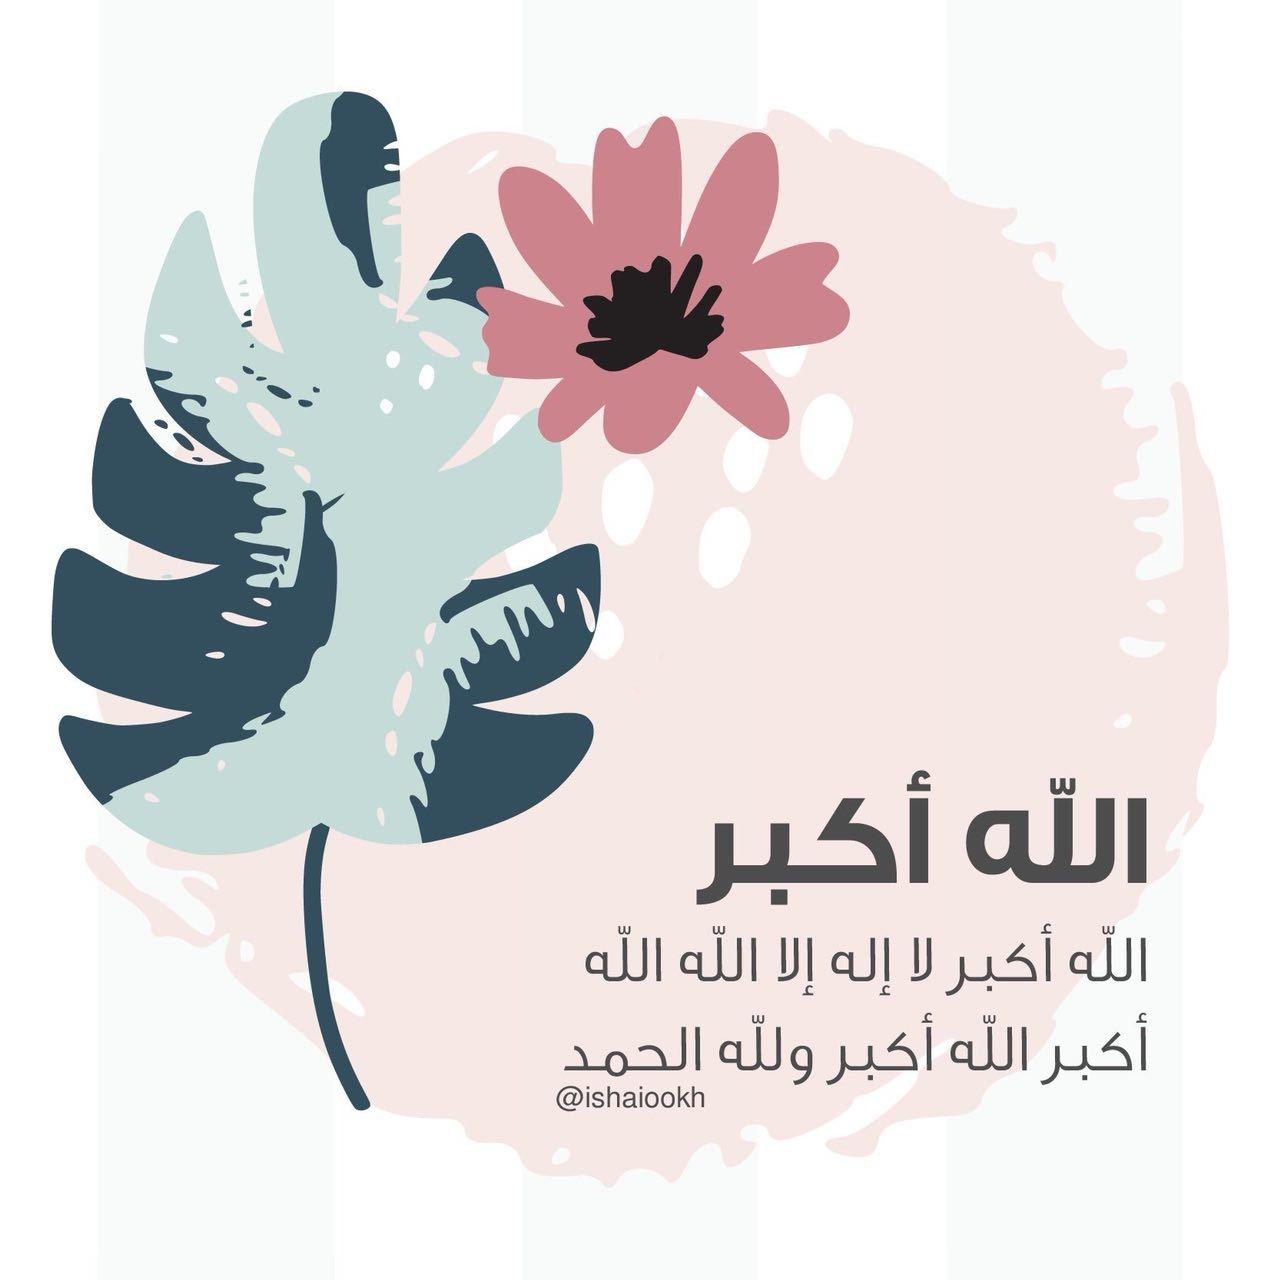 Pin By صدقة جارية On عشرة ذي الحجة Flower Frame Home Decor Decals Islam